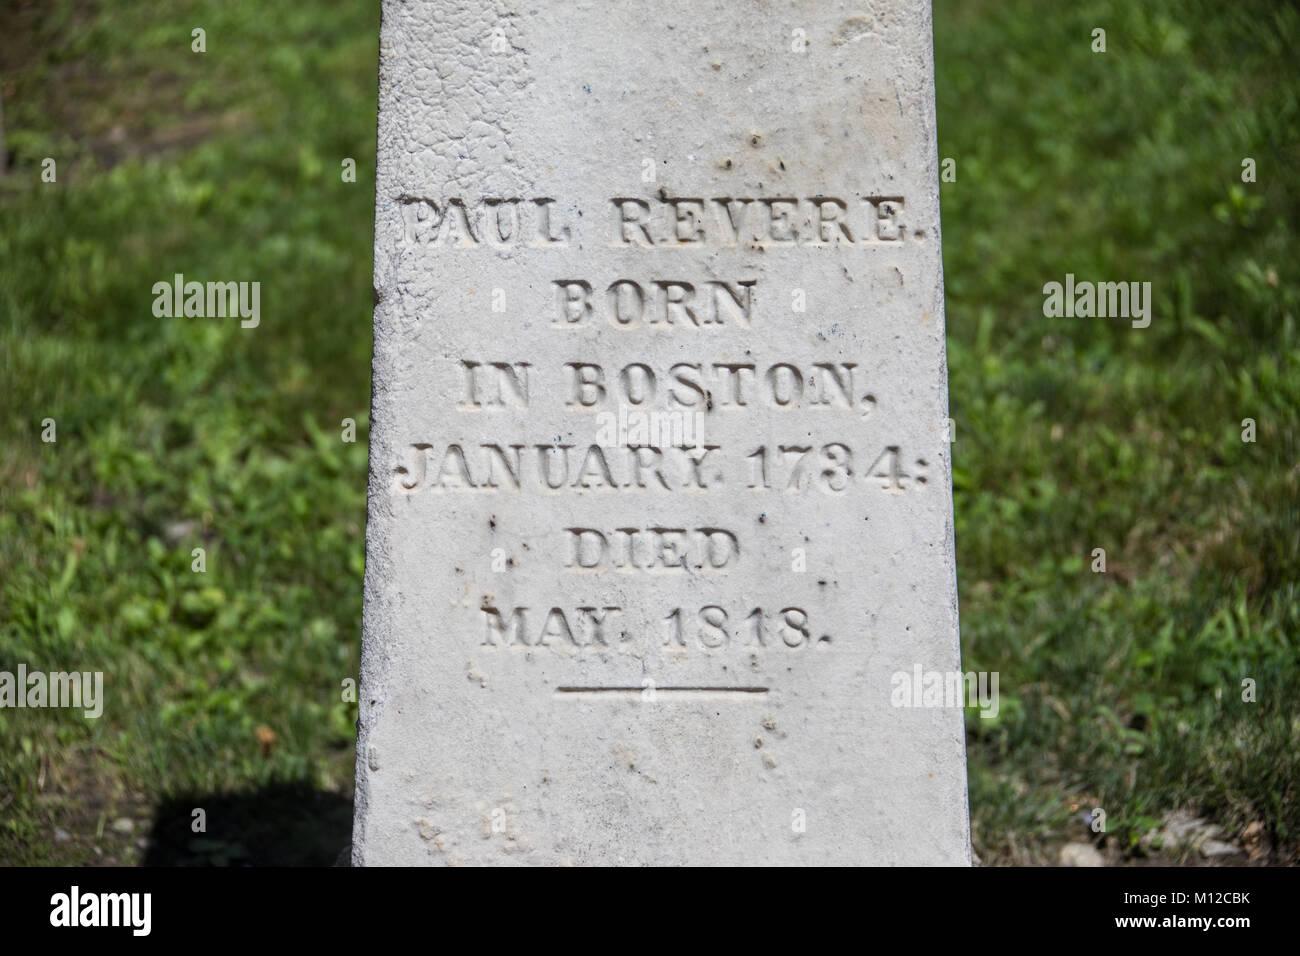 Grave marker of Paul Revere, Granary Burying Ground, Boston, MA, USA Stock Photo